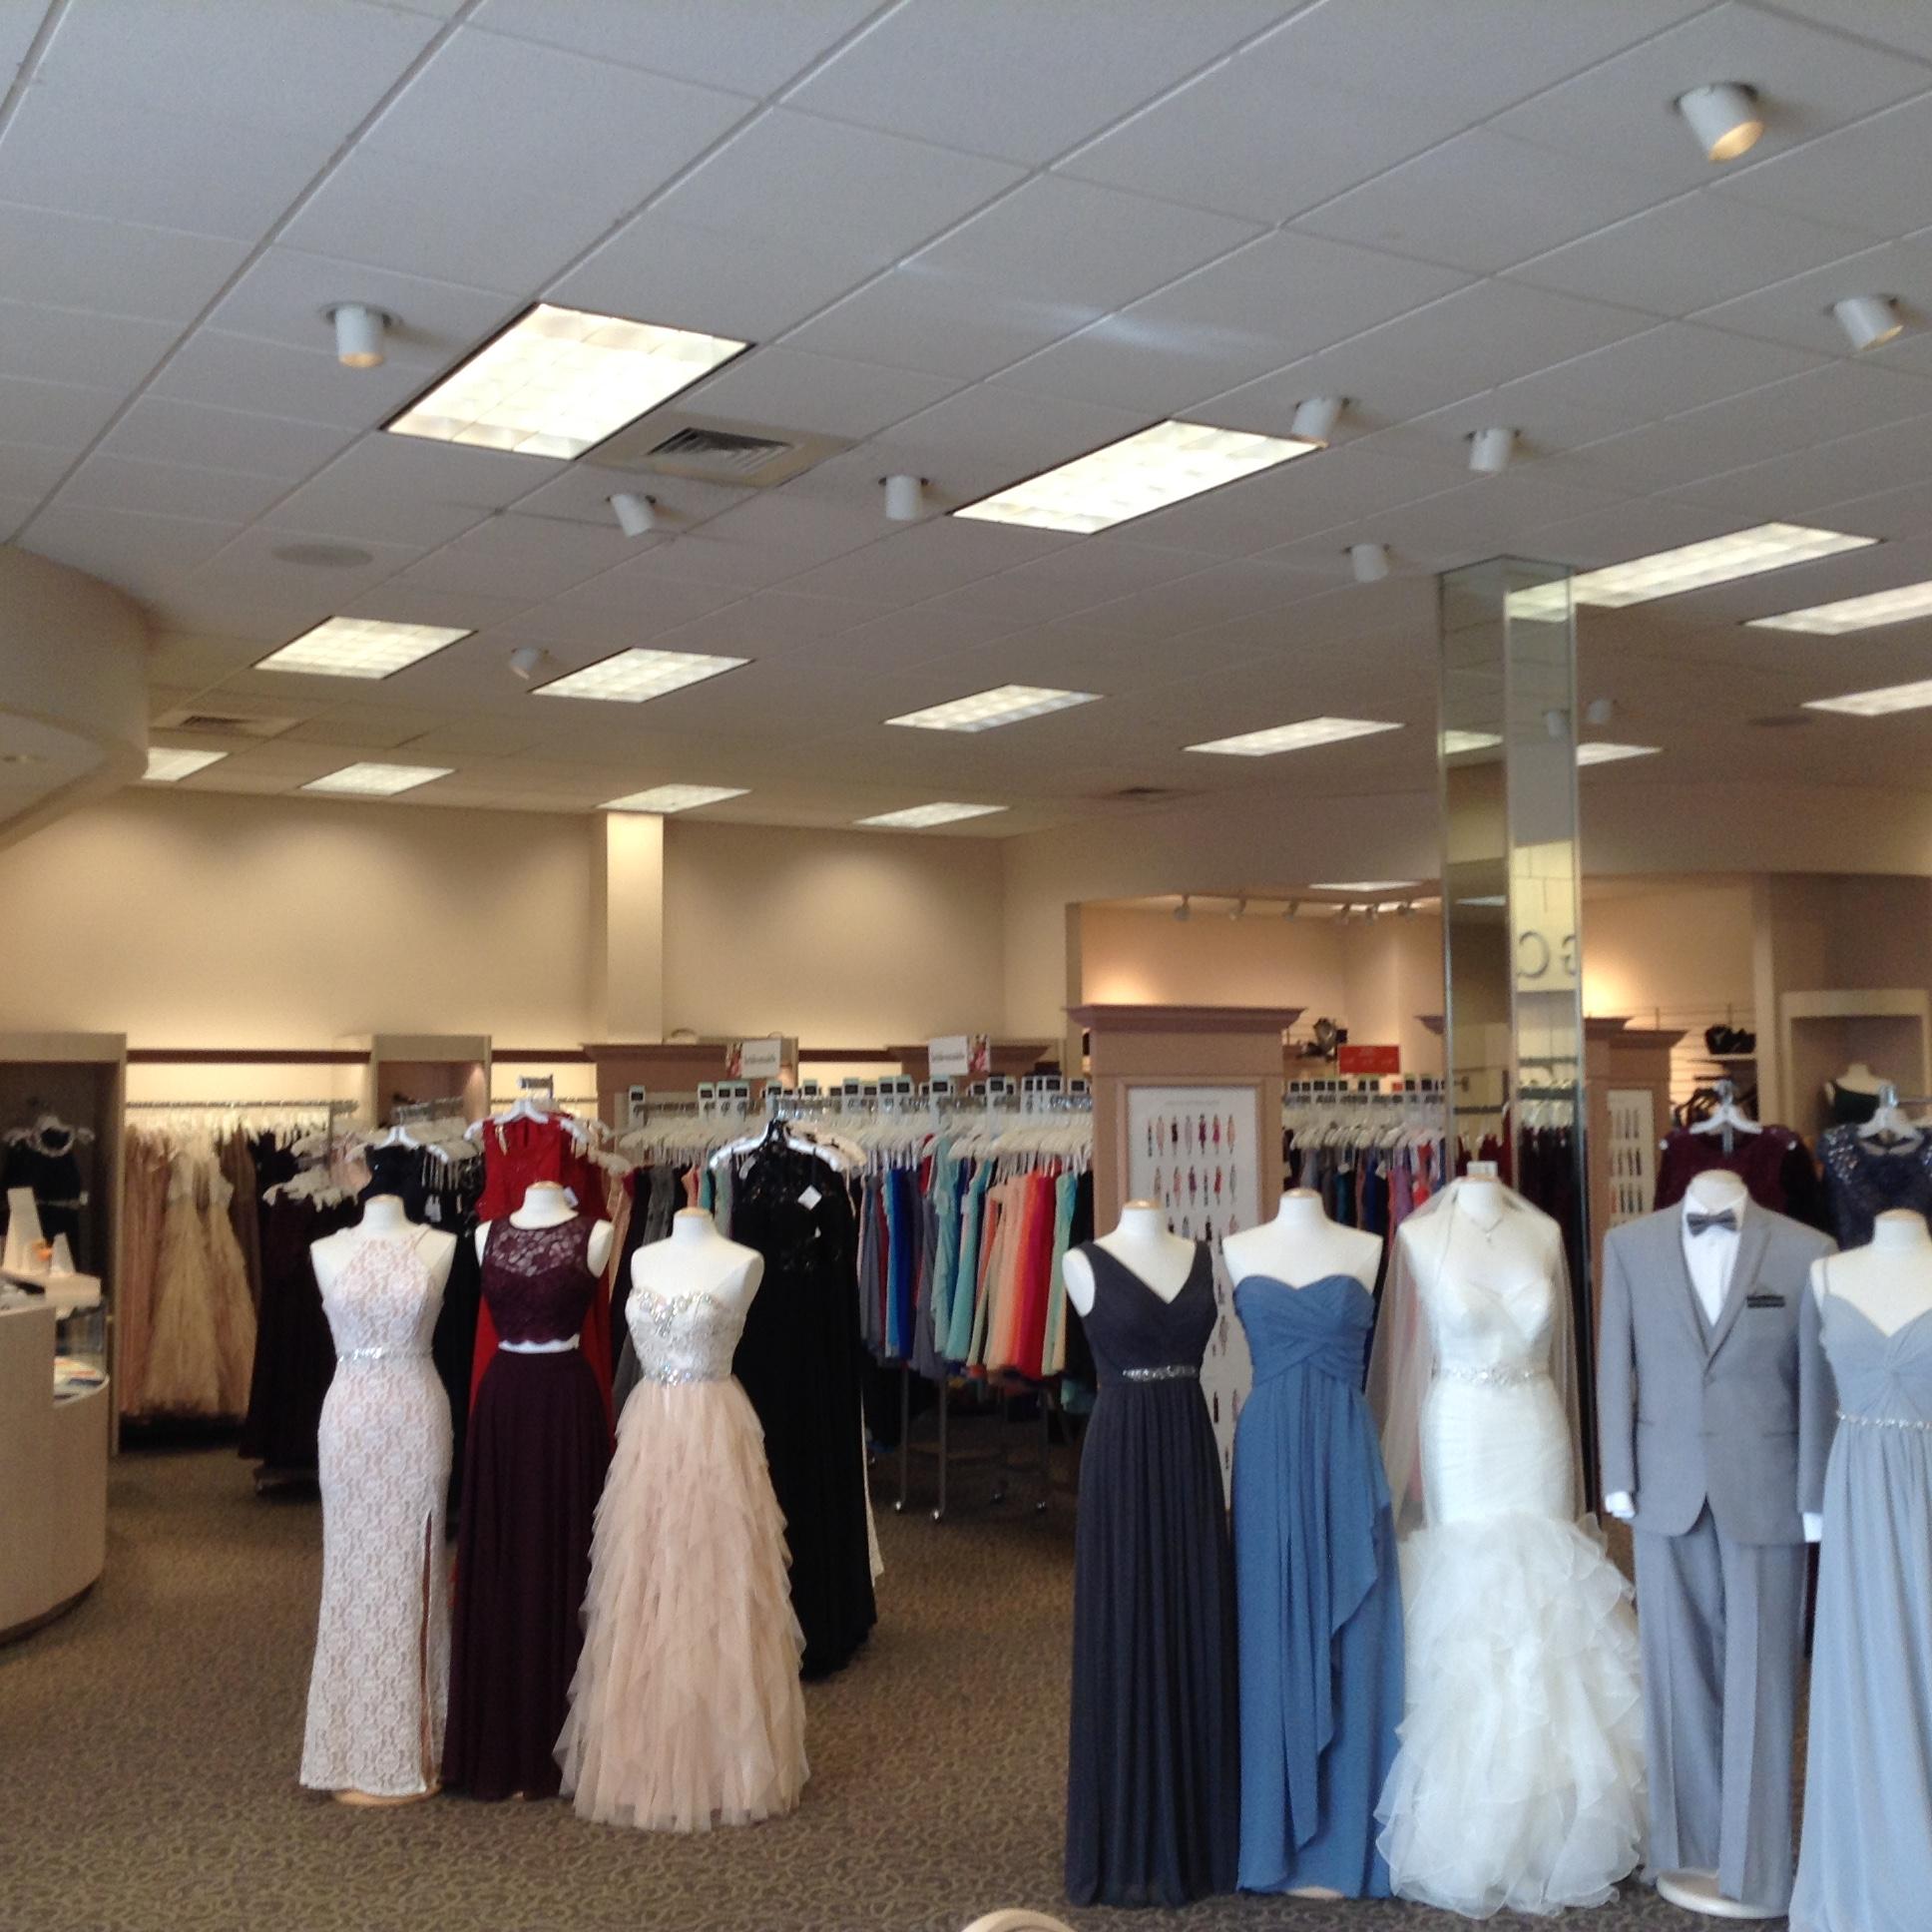 David's Bridal, Abilene Texas (TX)